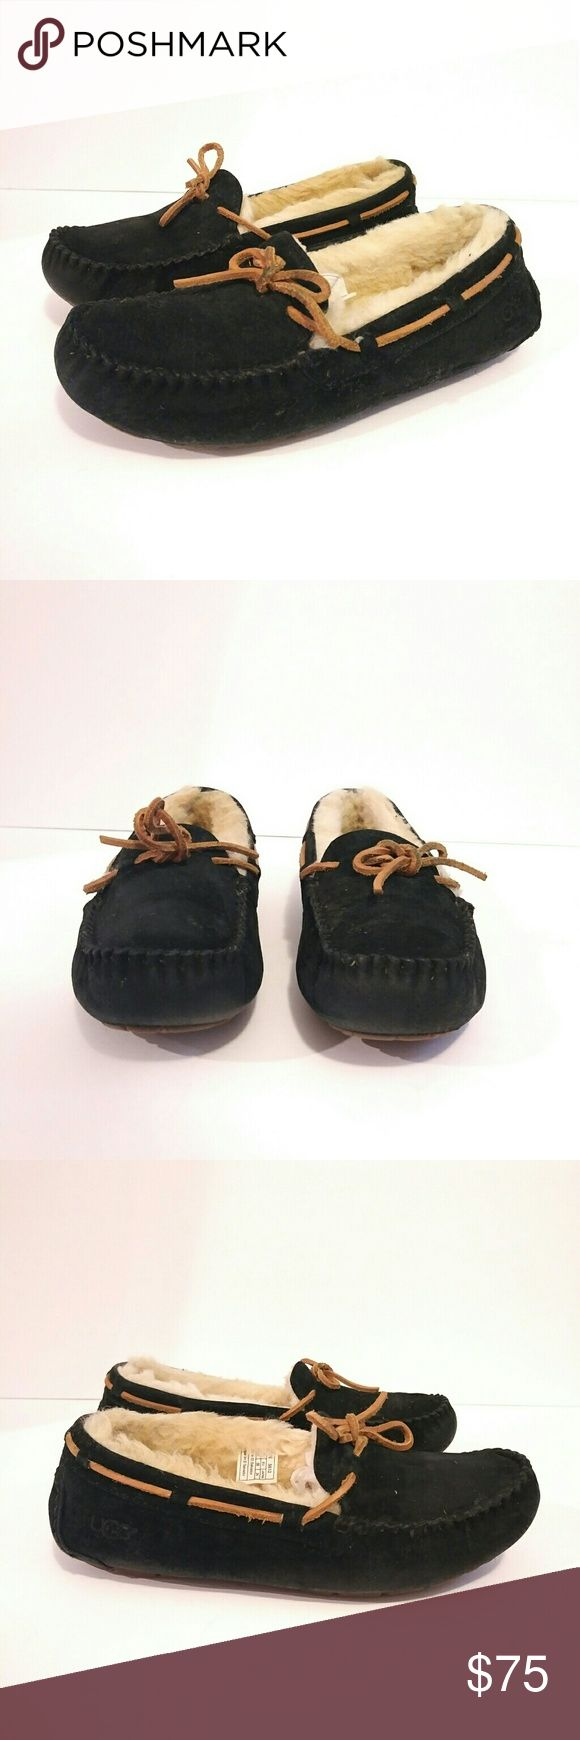 UGG australia black moccassin size 7 UGG Australia Black shoes flats moccassin  Indoor outdoor slipper Women's size 7 eu 38 Black and tan Sheepskin slippers UGG Shoes Moccasins